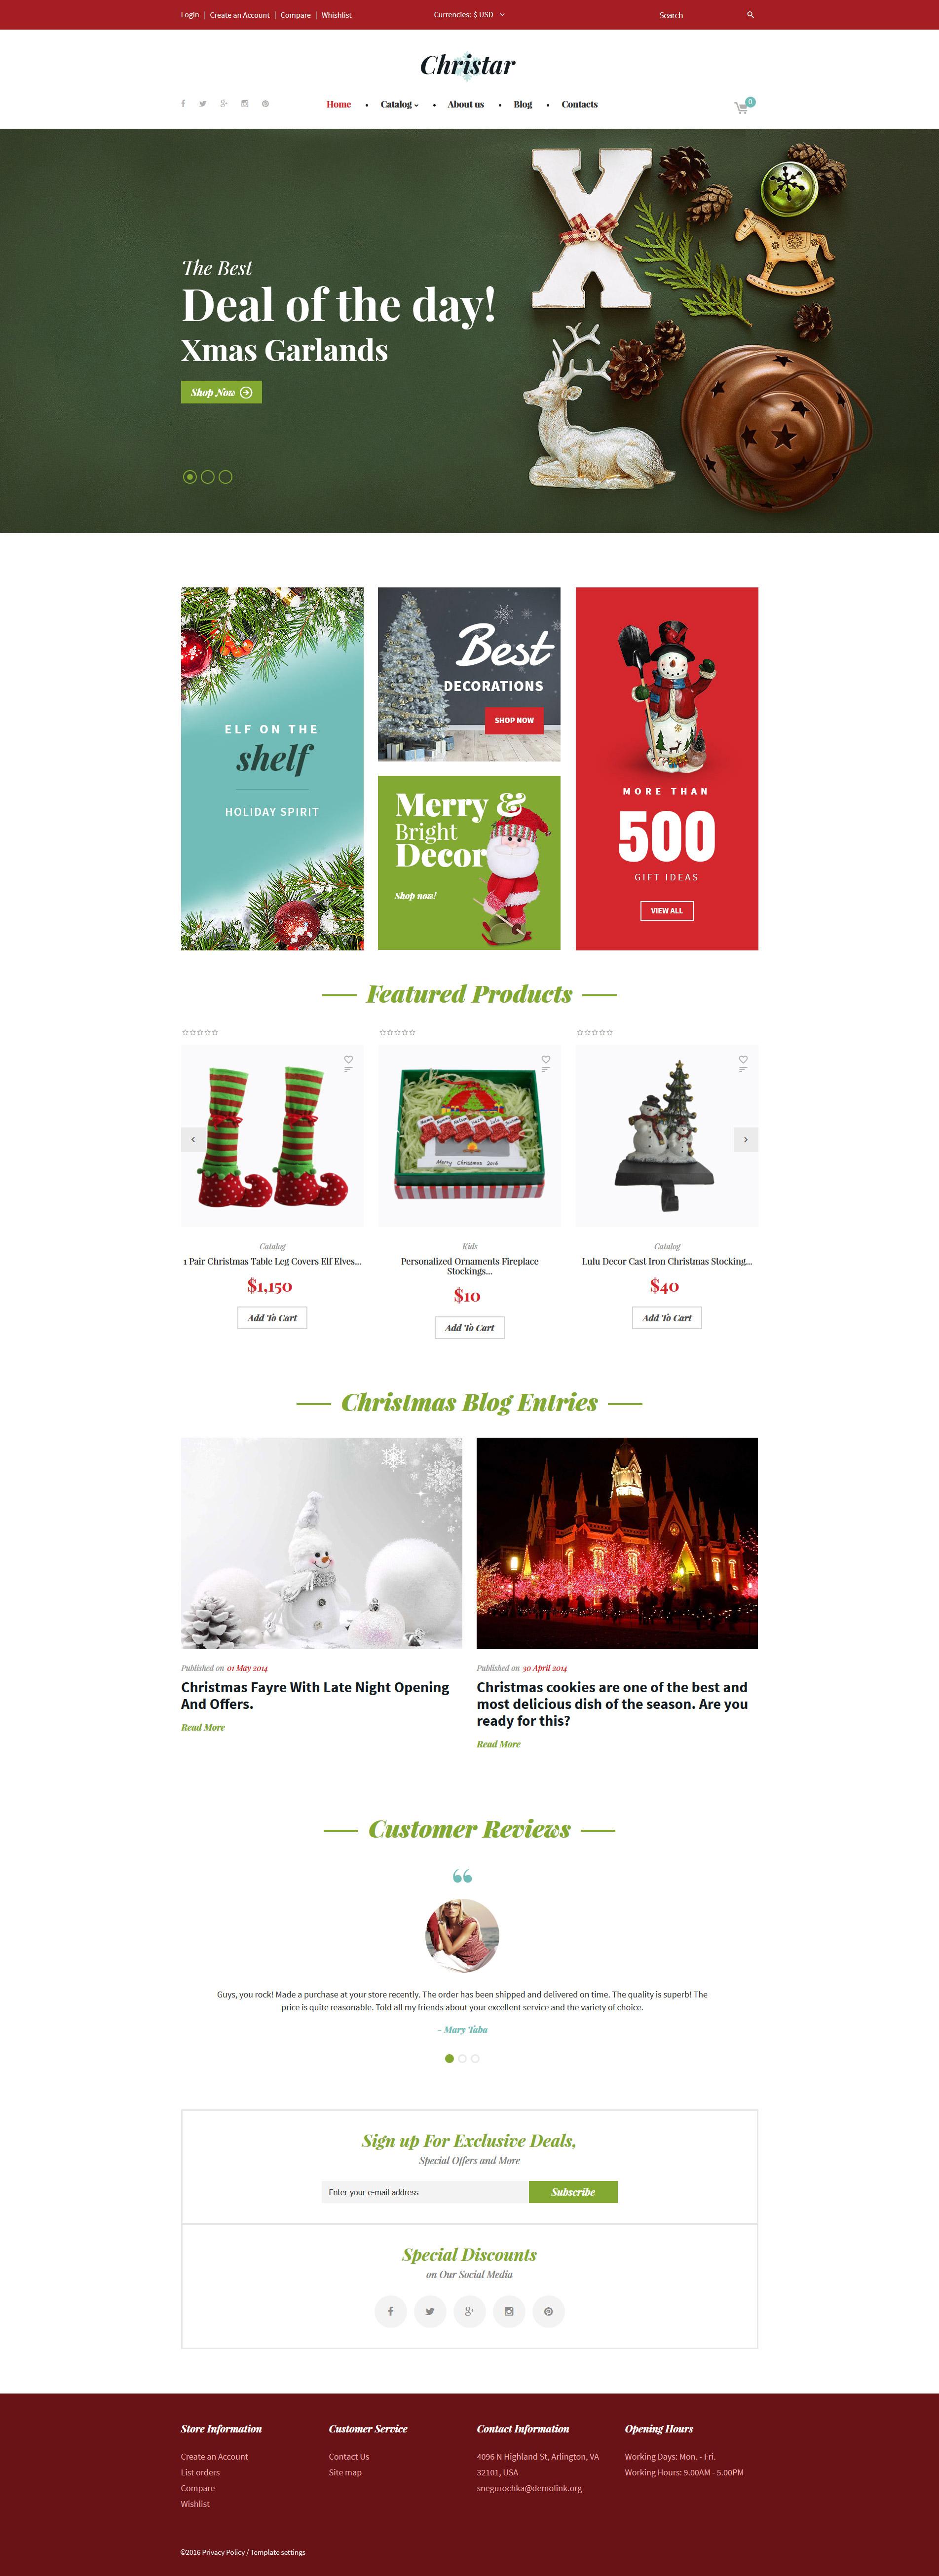 Christmas VirtueMart Template - screenshot